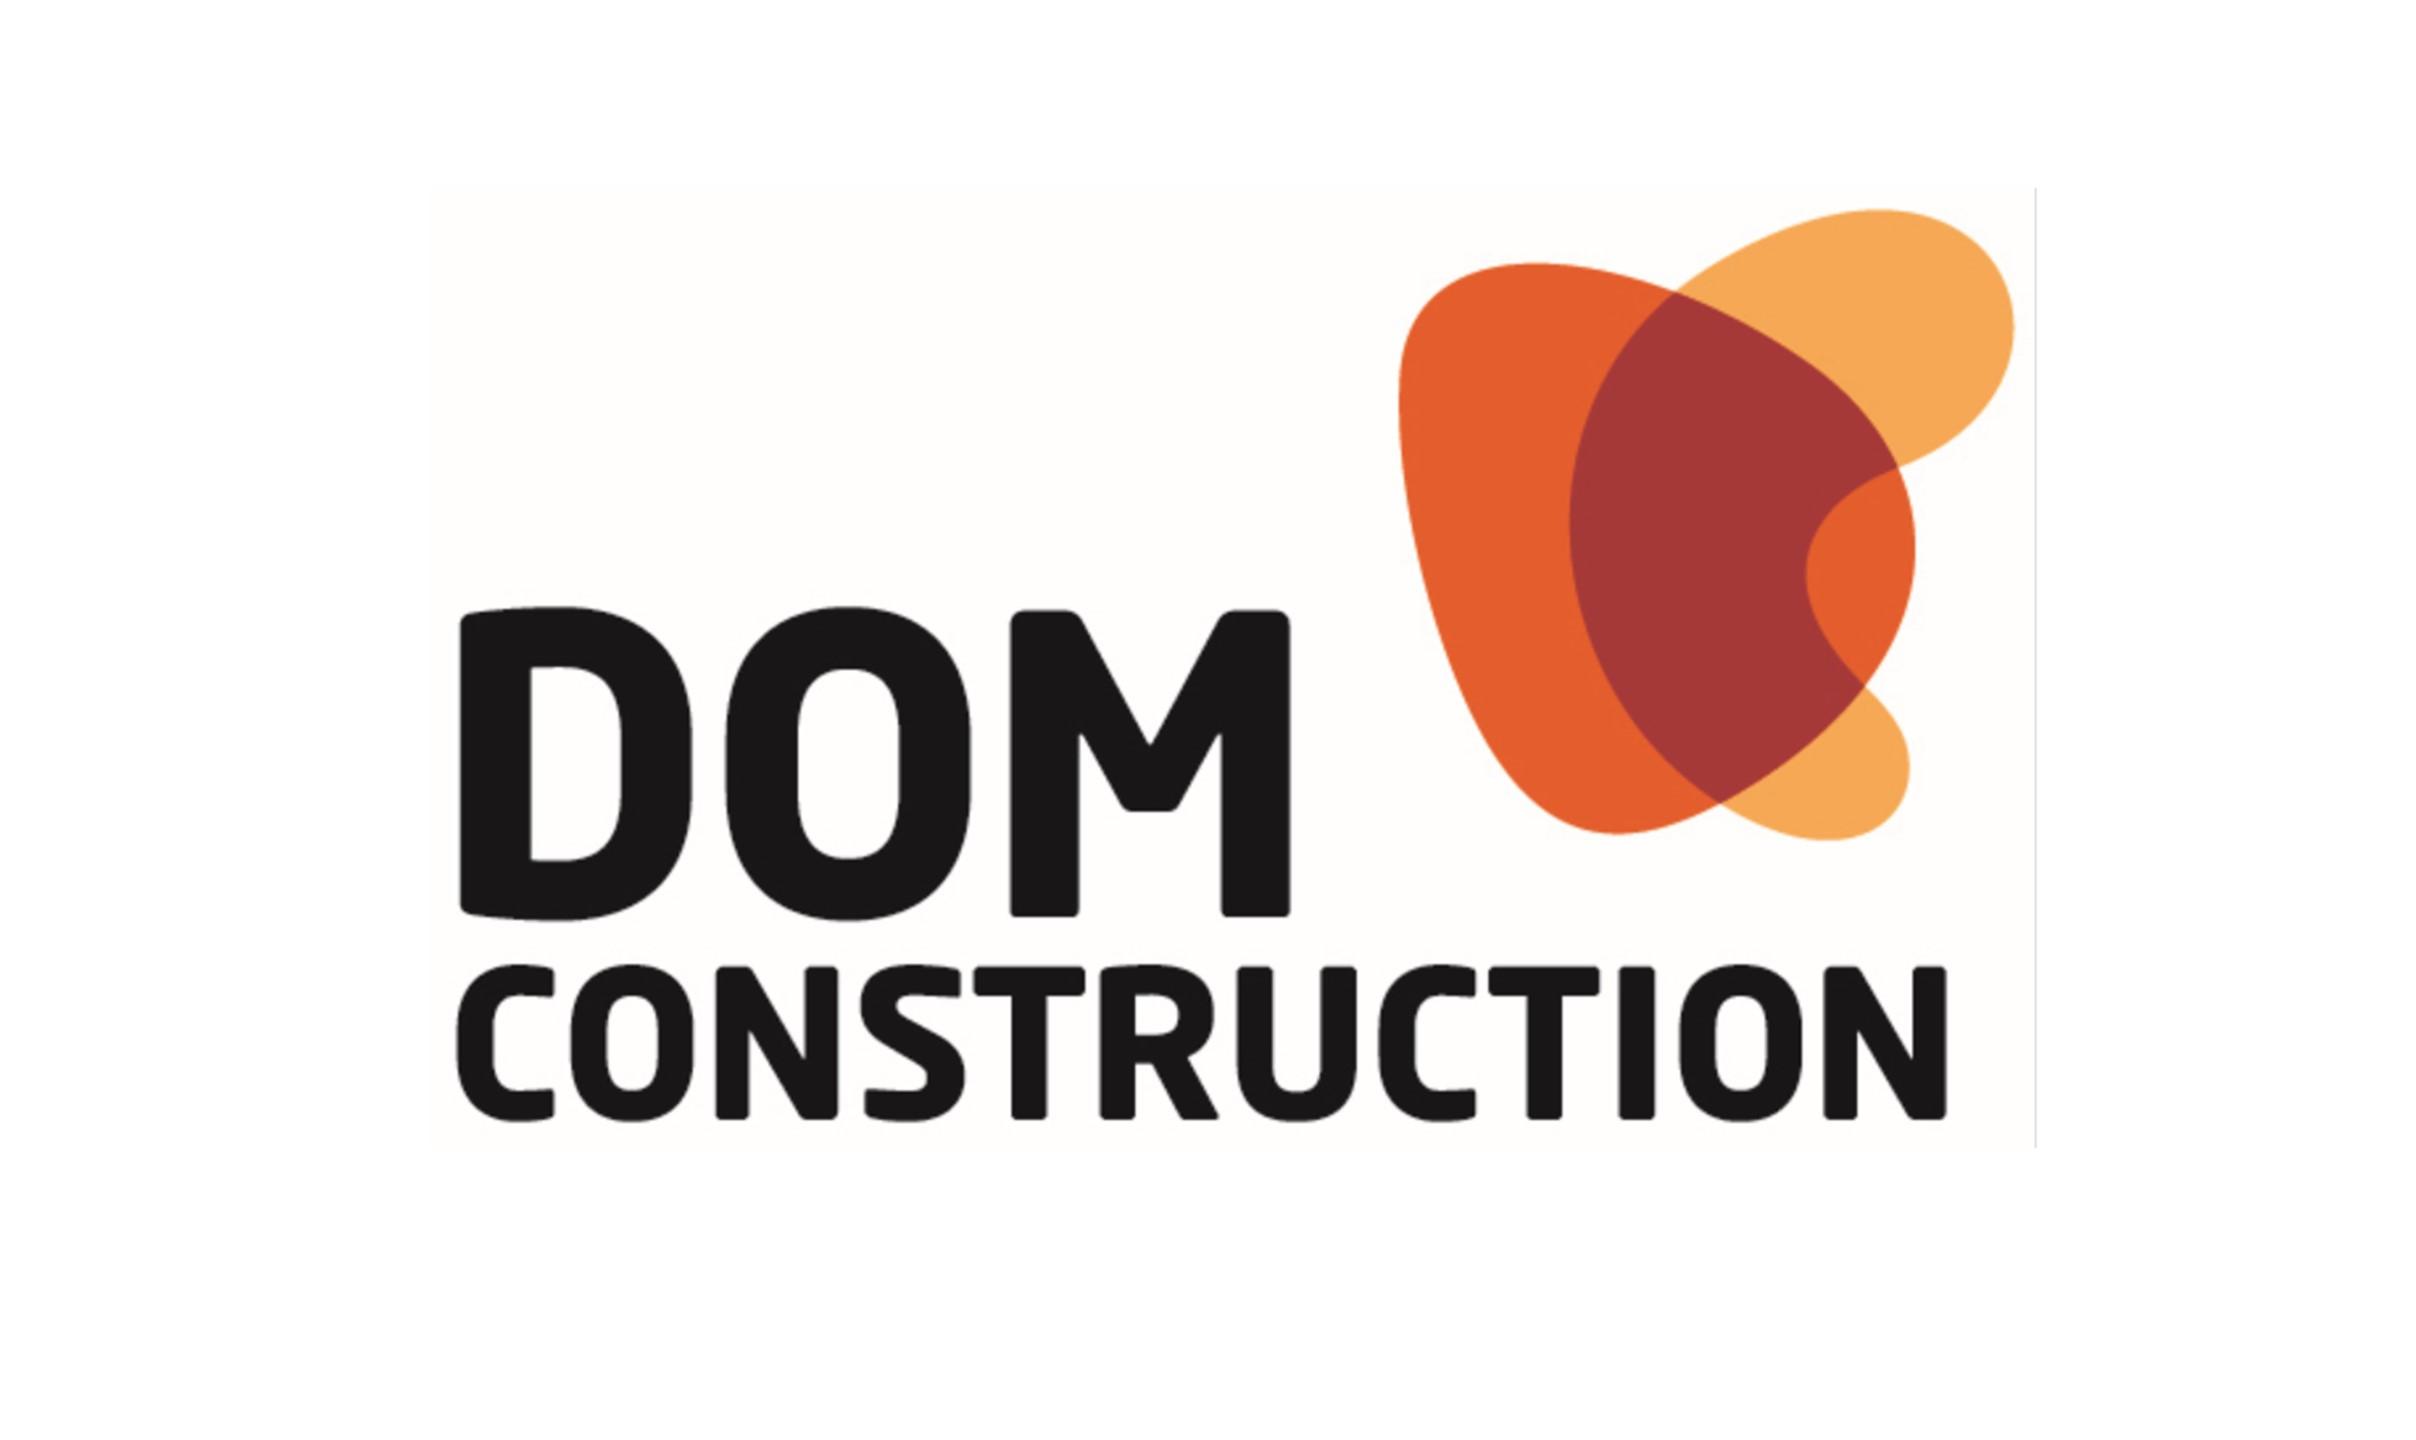 DOM CONSTRUCTION PARTNEREM